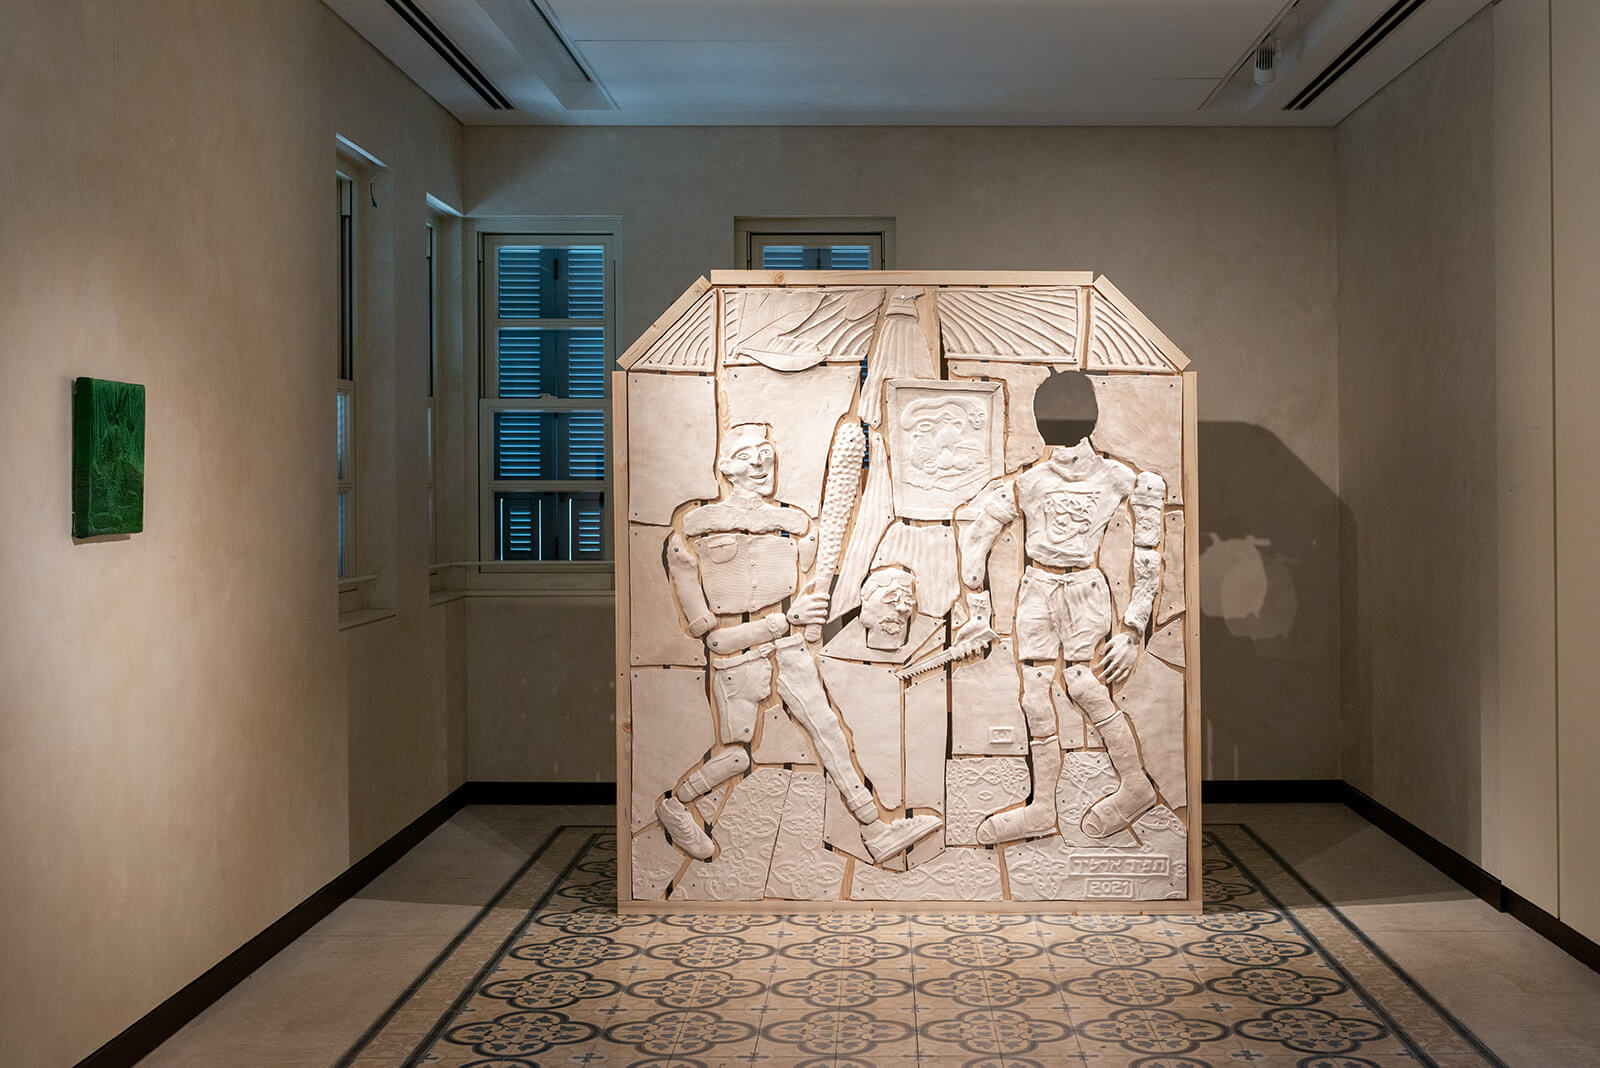 Tamir Erlich, Riot in the gallery, 2021, ceramics, wood, sandbags<br /> Photography: Neta Cones